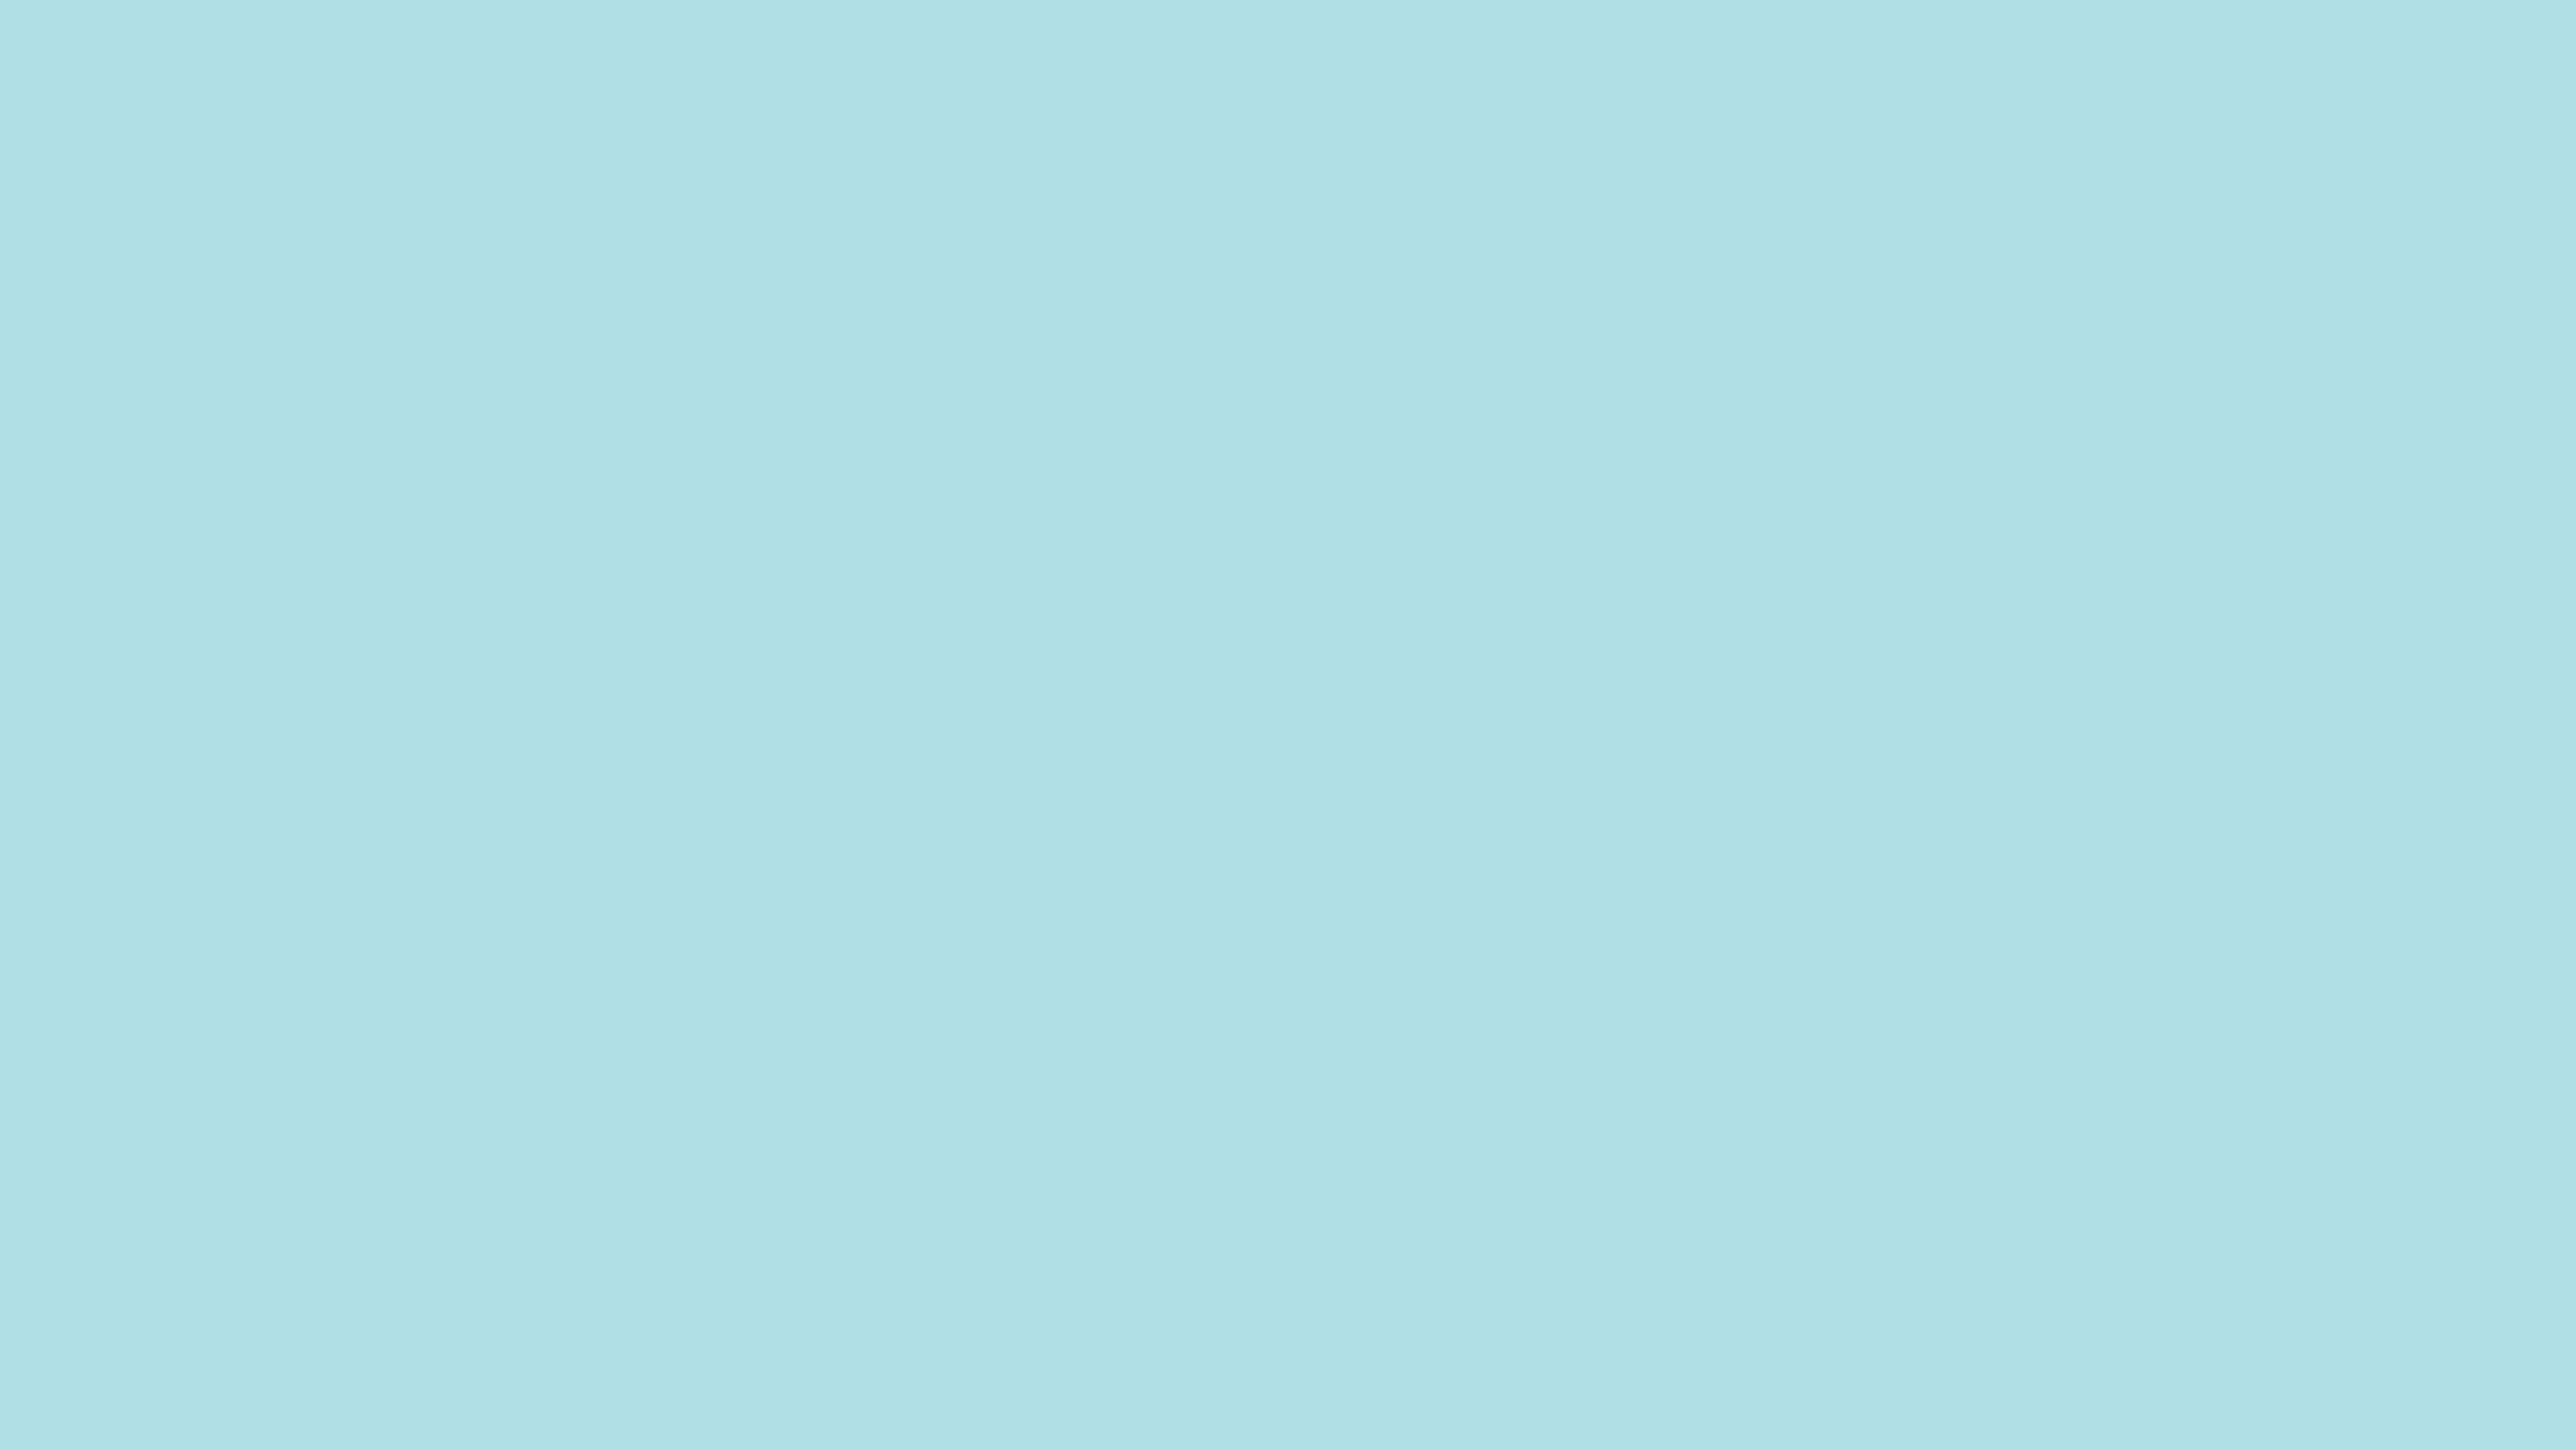 5120x2880 Powder Blue Web Solid Color Background